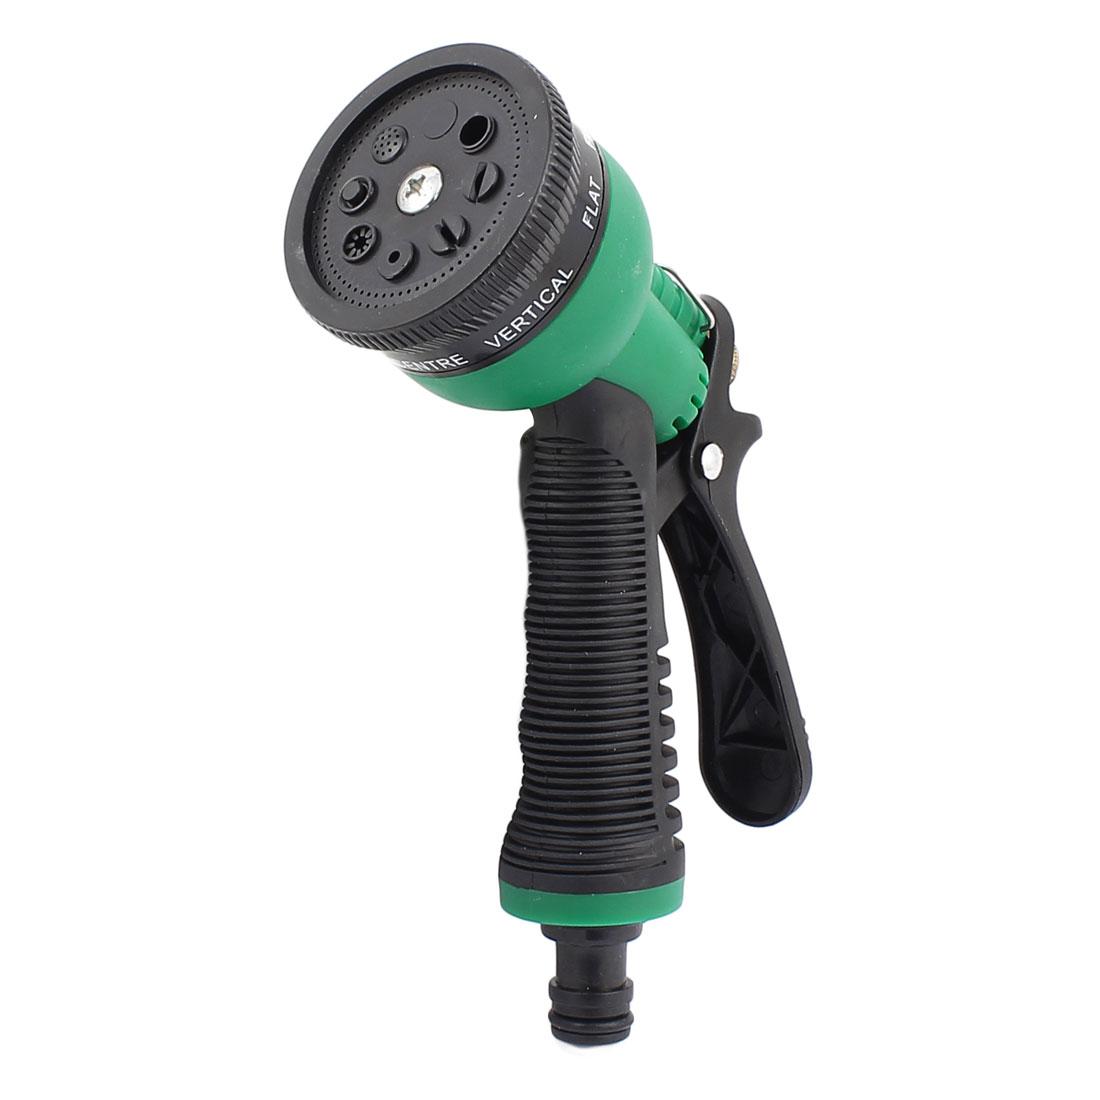 Garden Lawn Plastic Hose Nozzle Sprinkler Head Water Trigger Sprayer